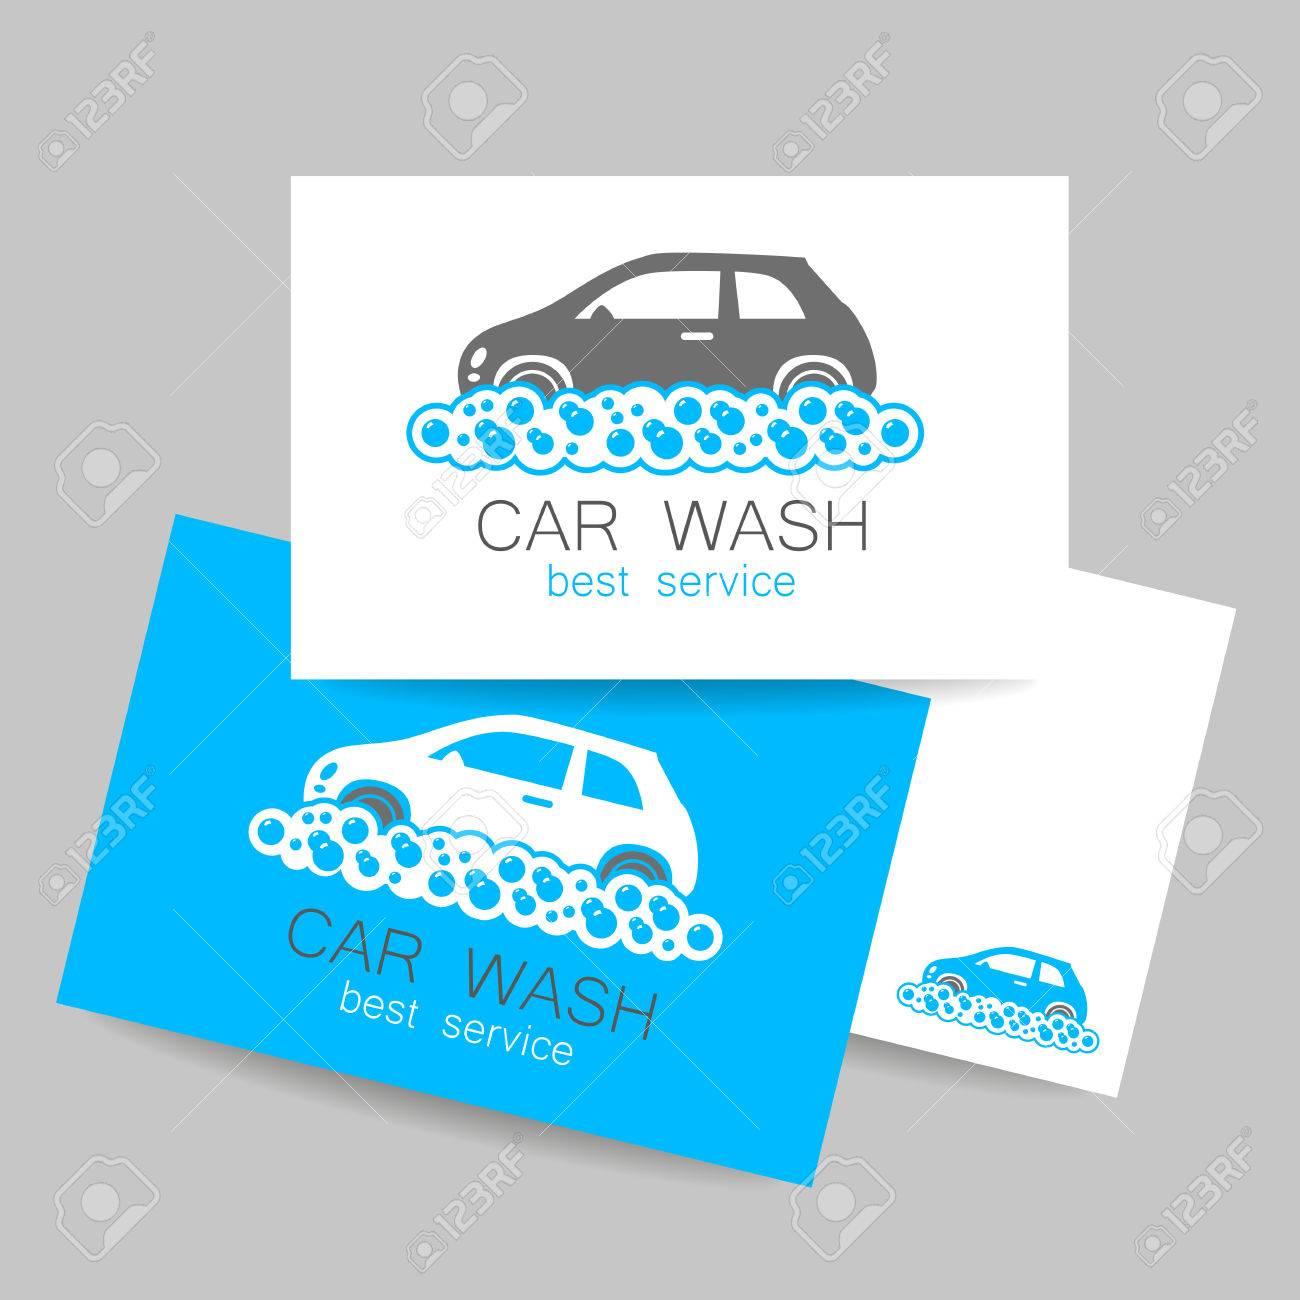 Car Wash Template. Identity Concept Car Wash Service. Business ...